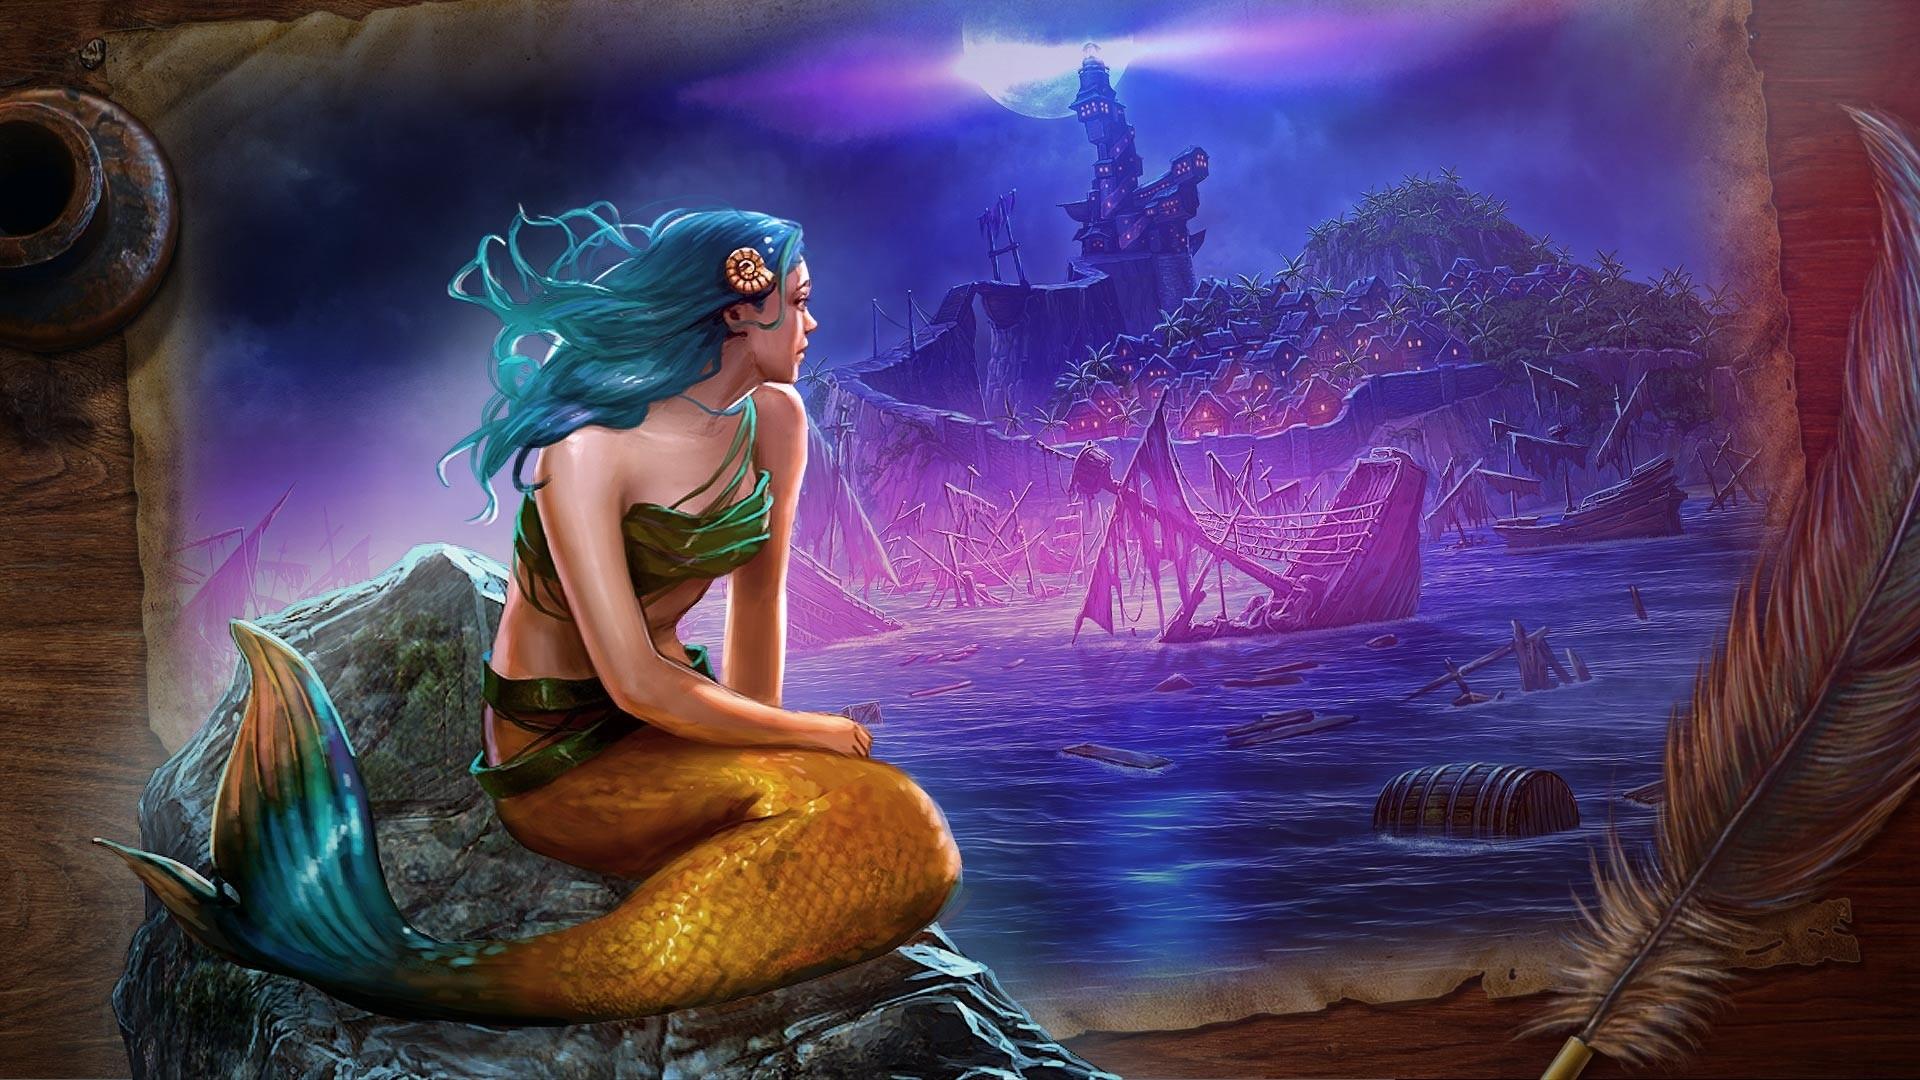 Mermaids wallpaper photo hd